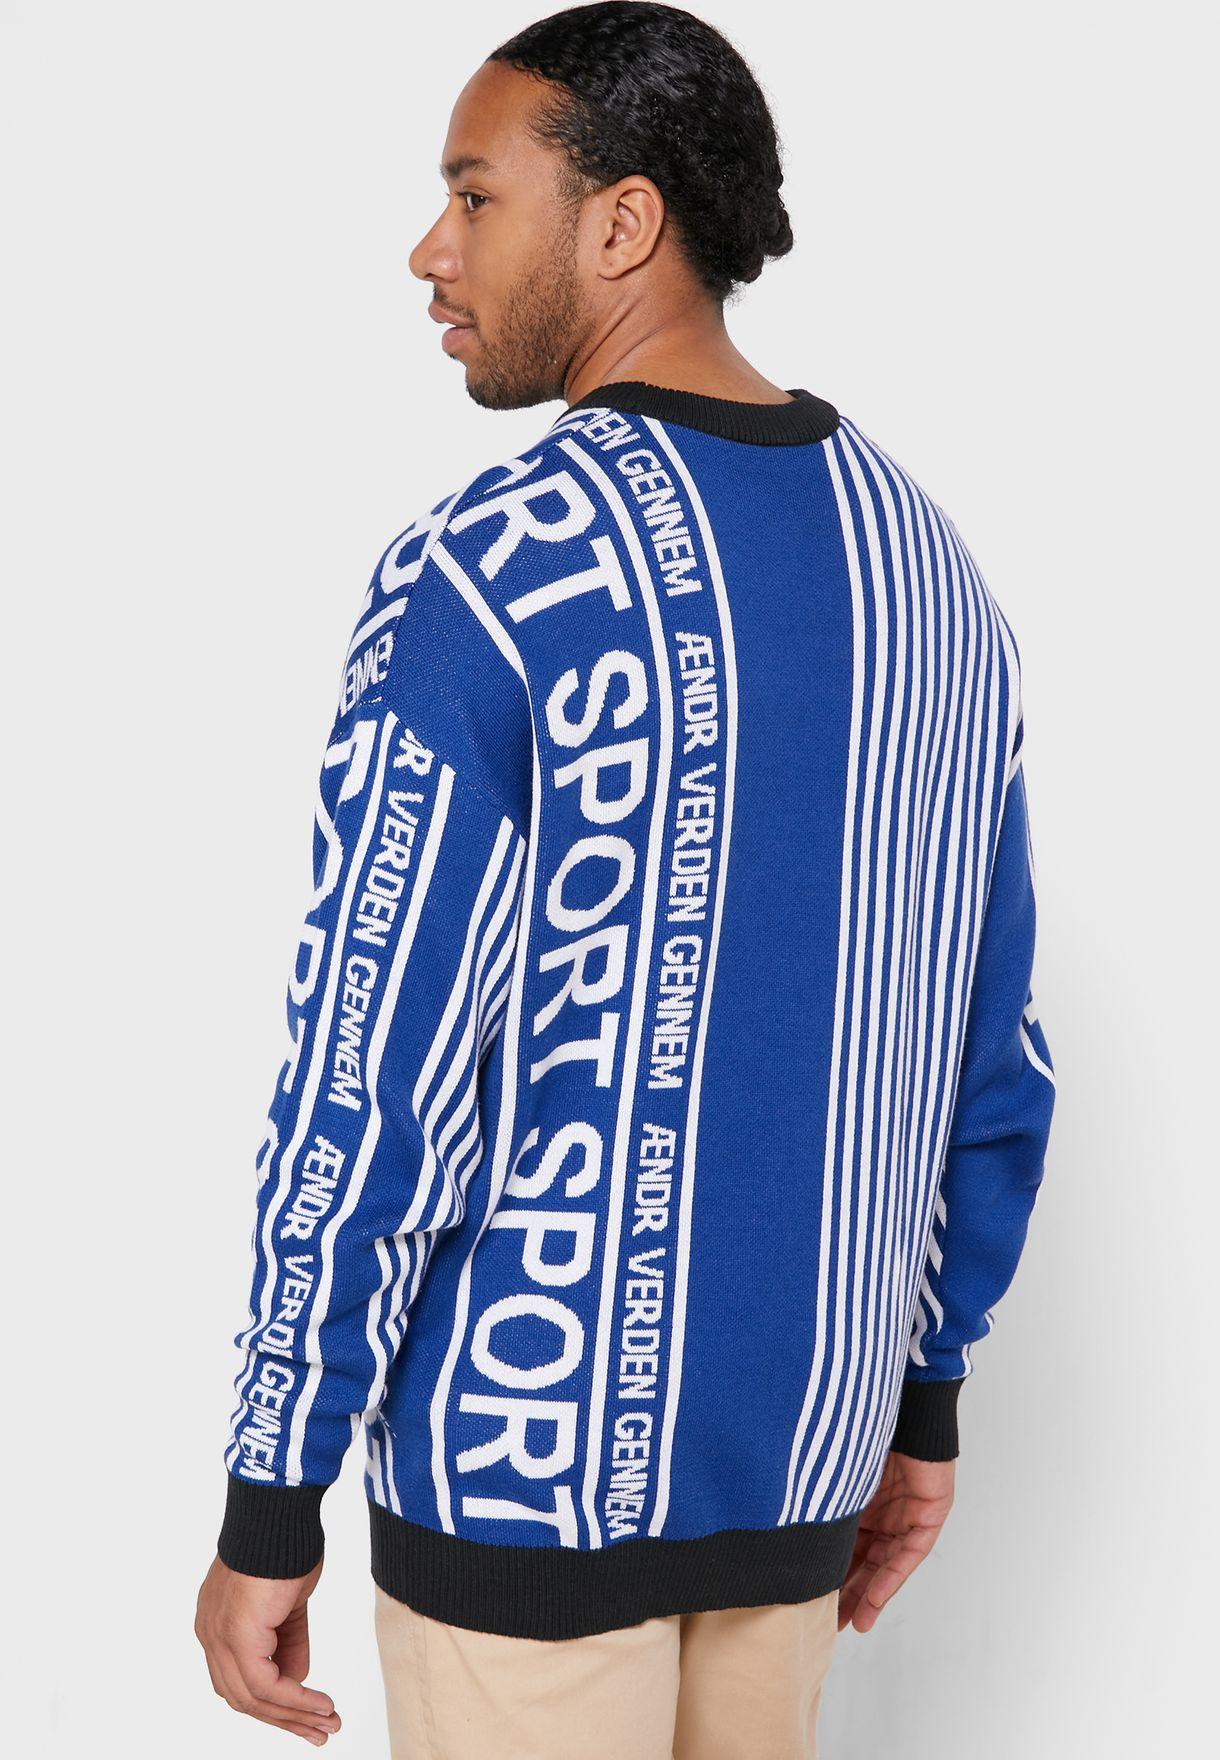 Breeze Knit Sweater